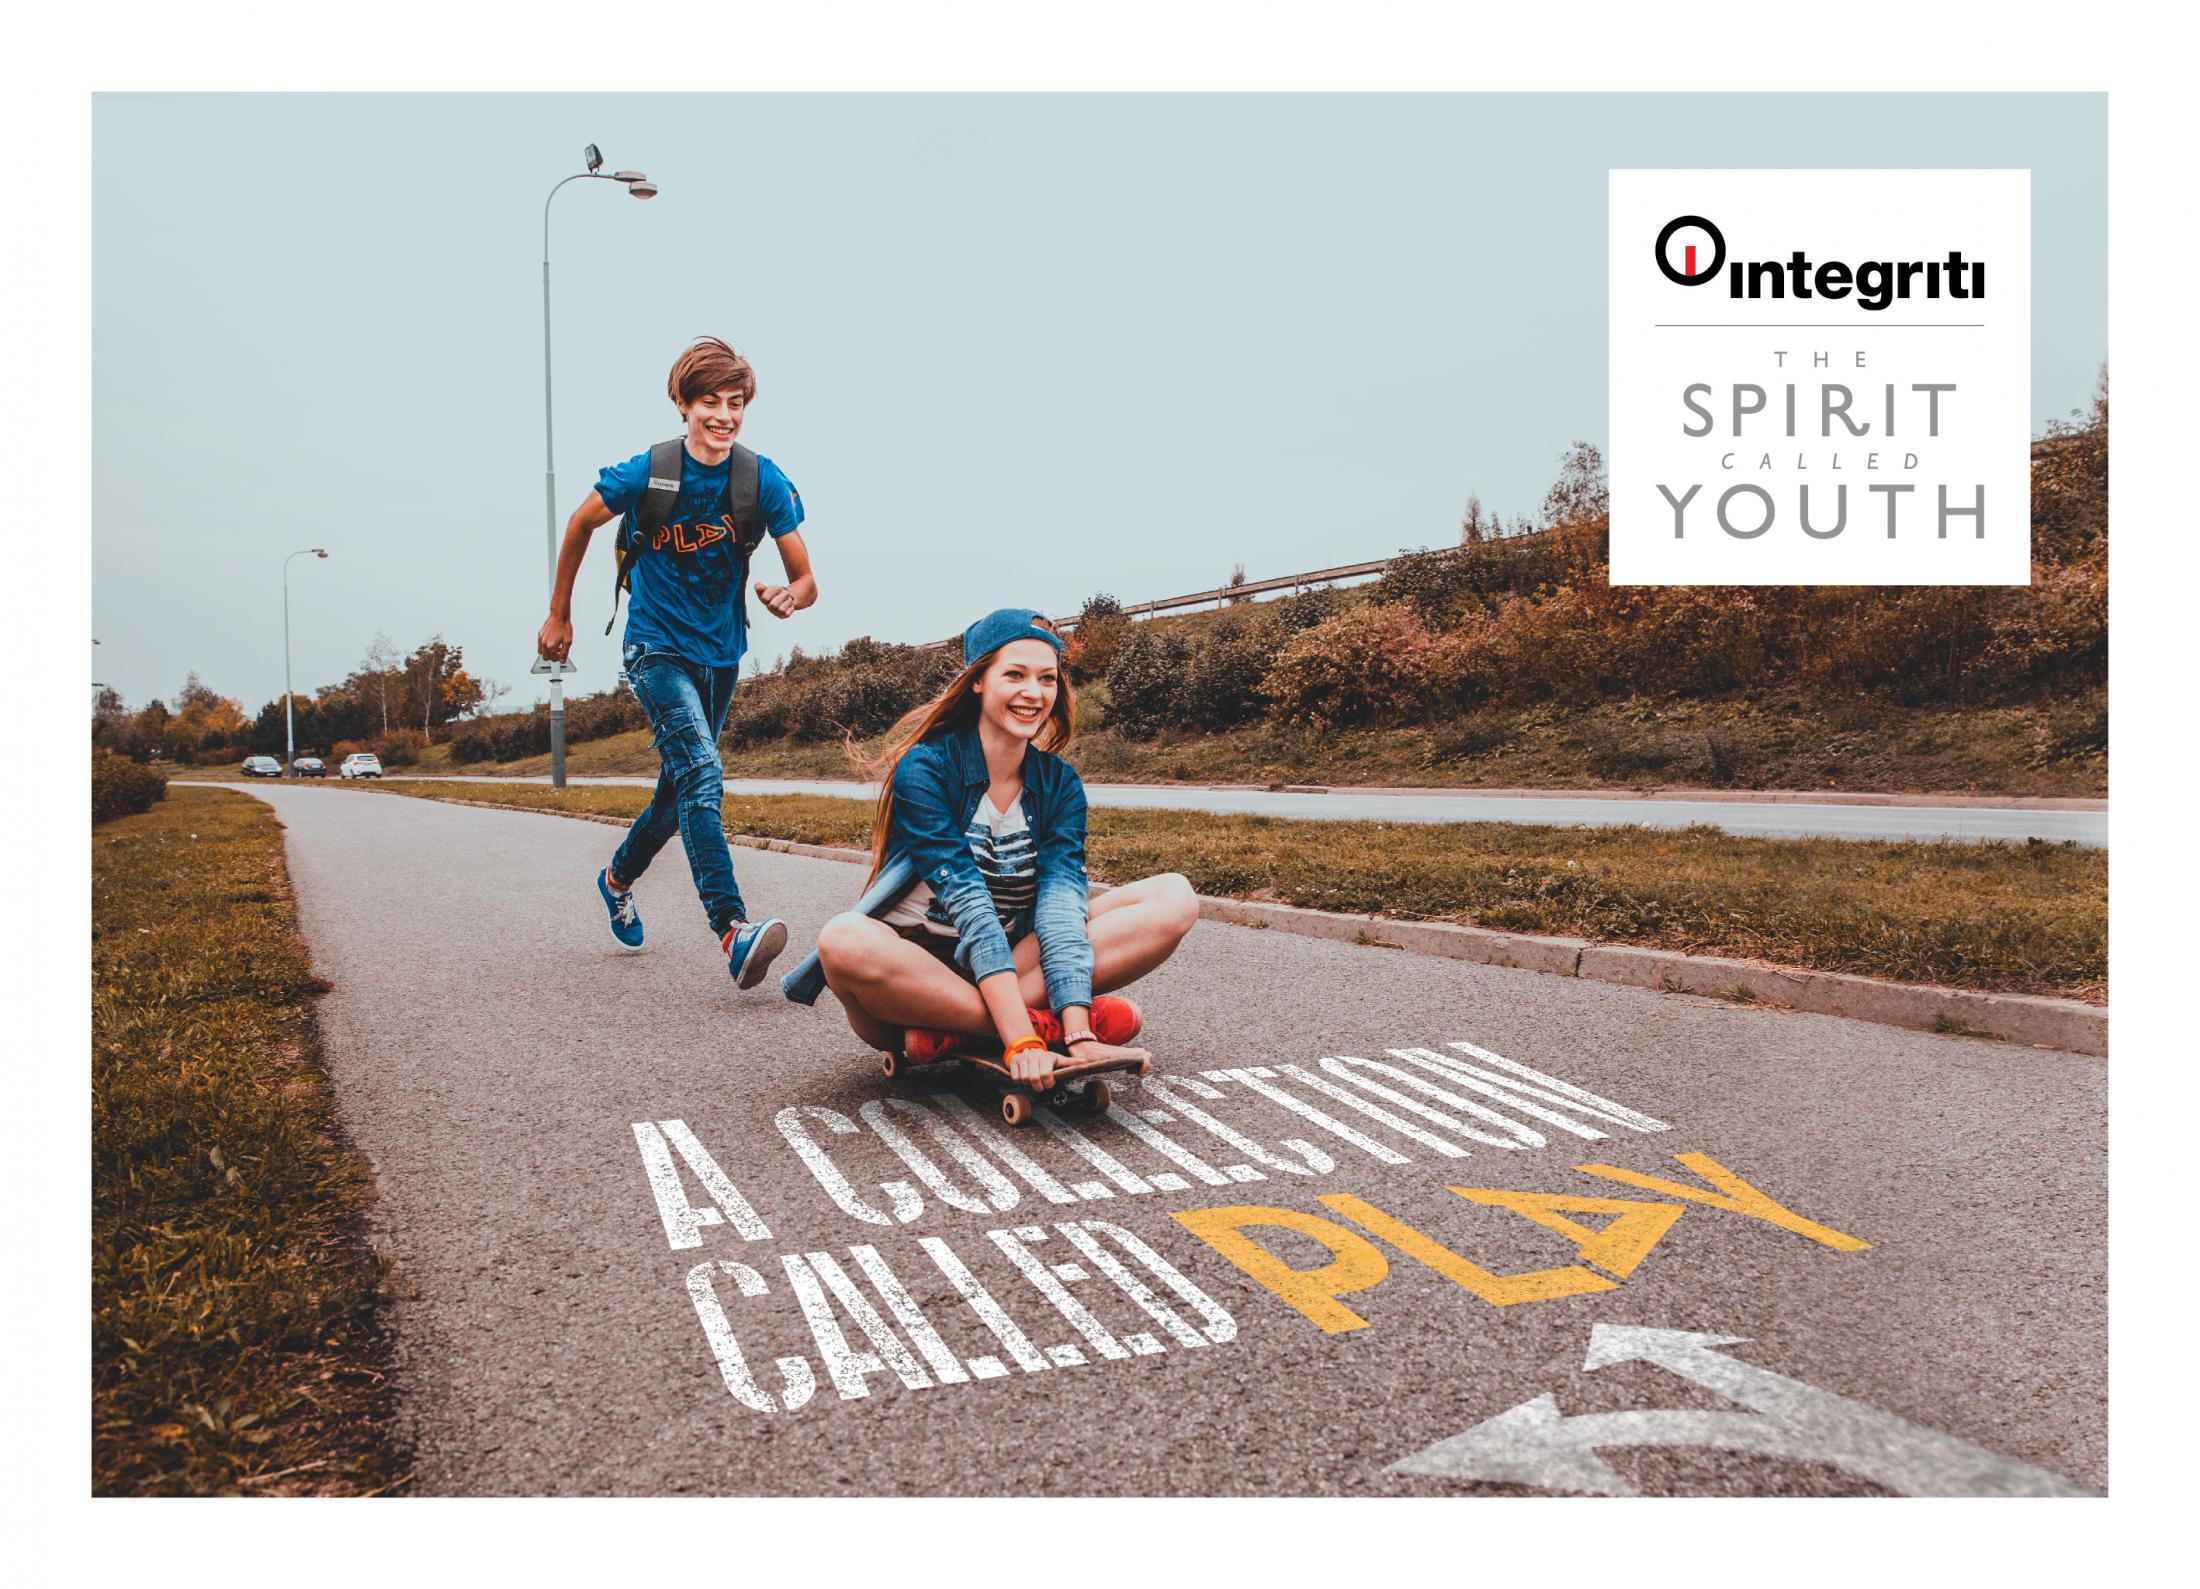 Integriti Print Ad - The spirit called youth, 4